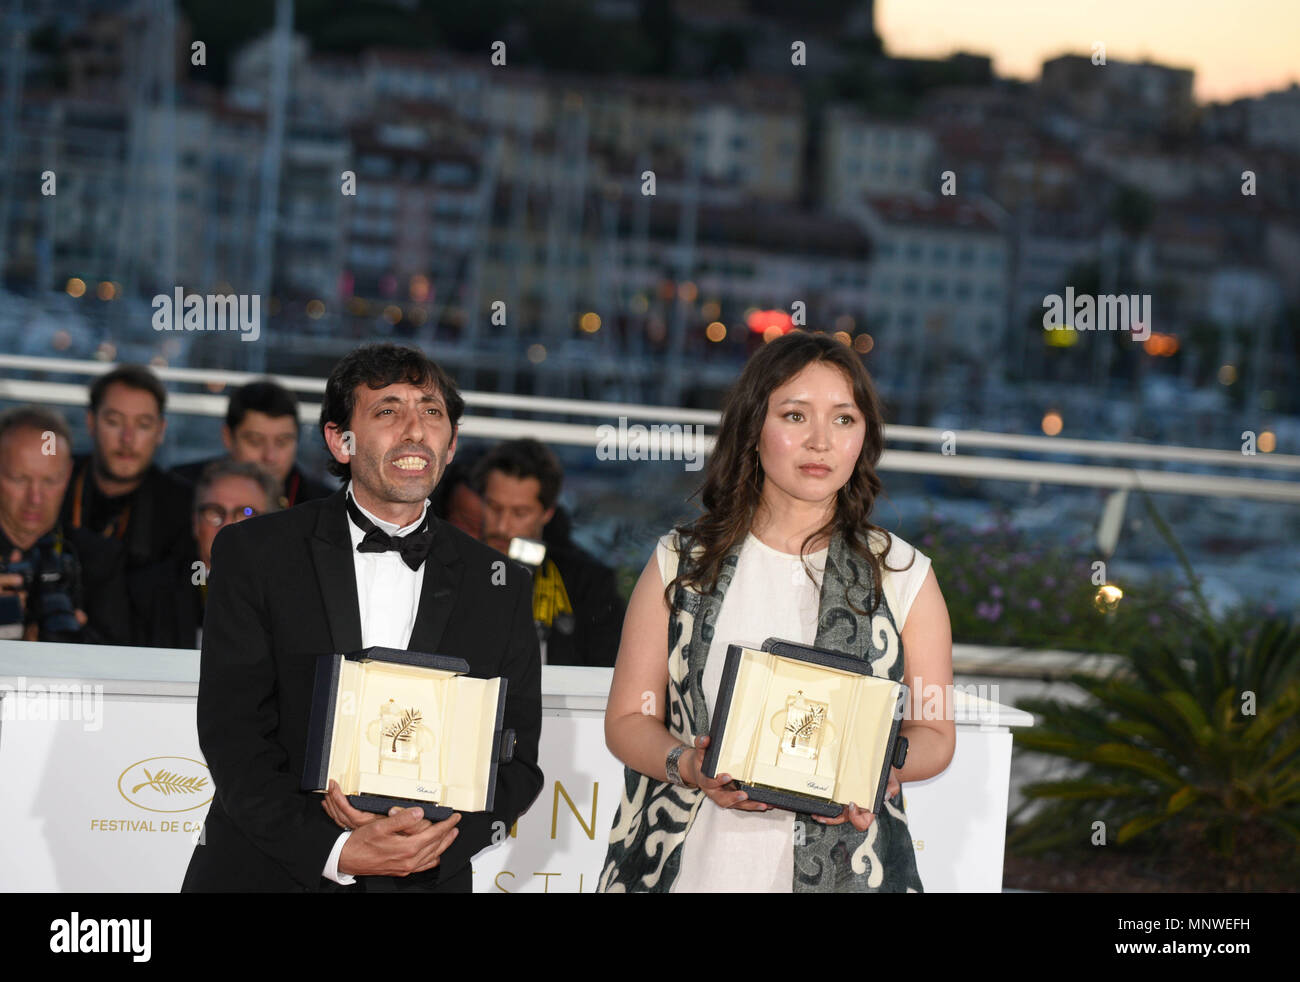 Mai 19 2018 Cannes Frankreich Marcello Fonte Und Samal